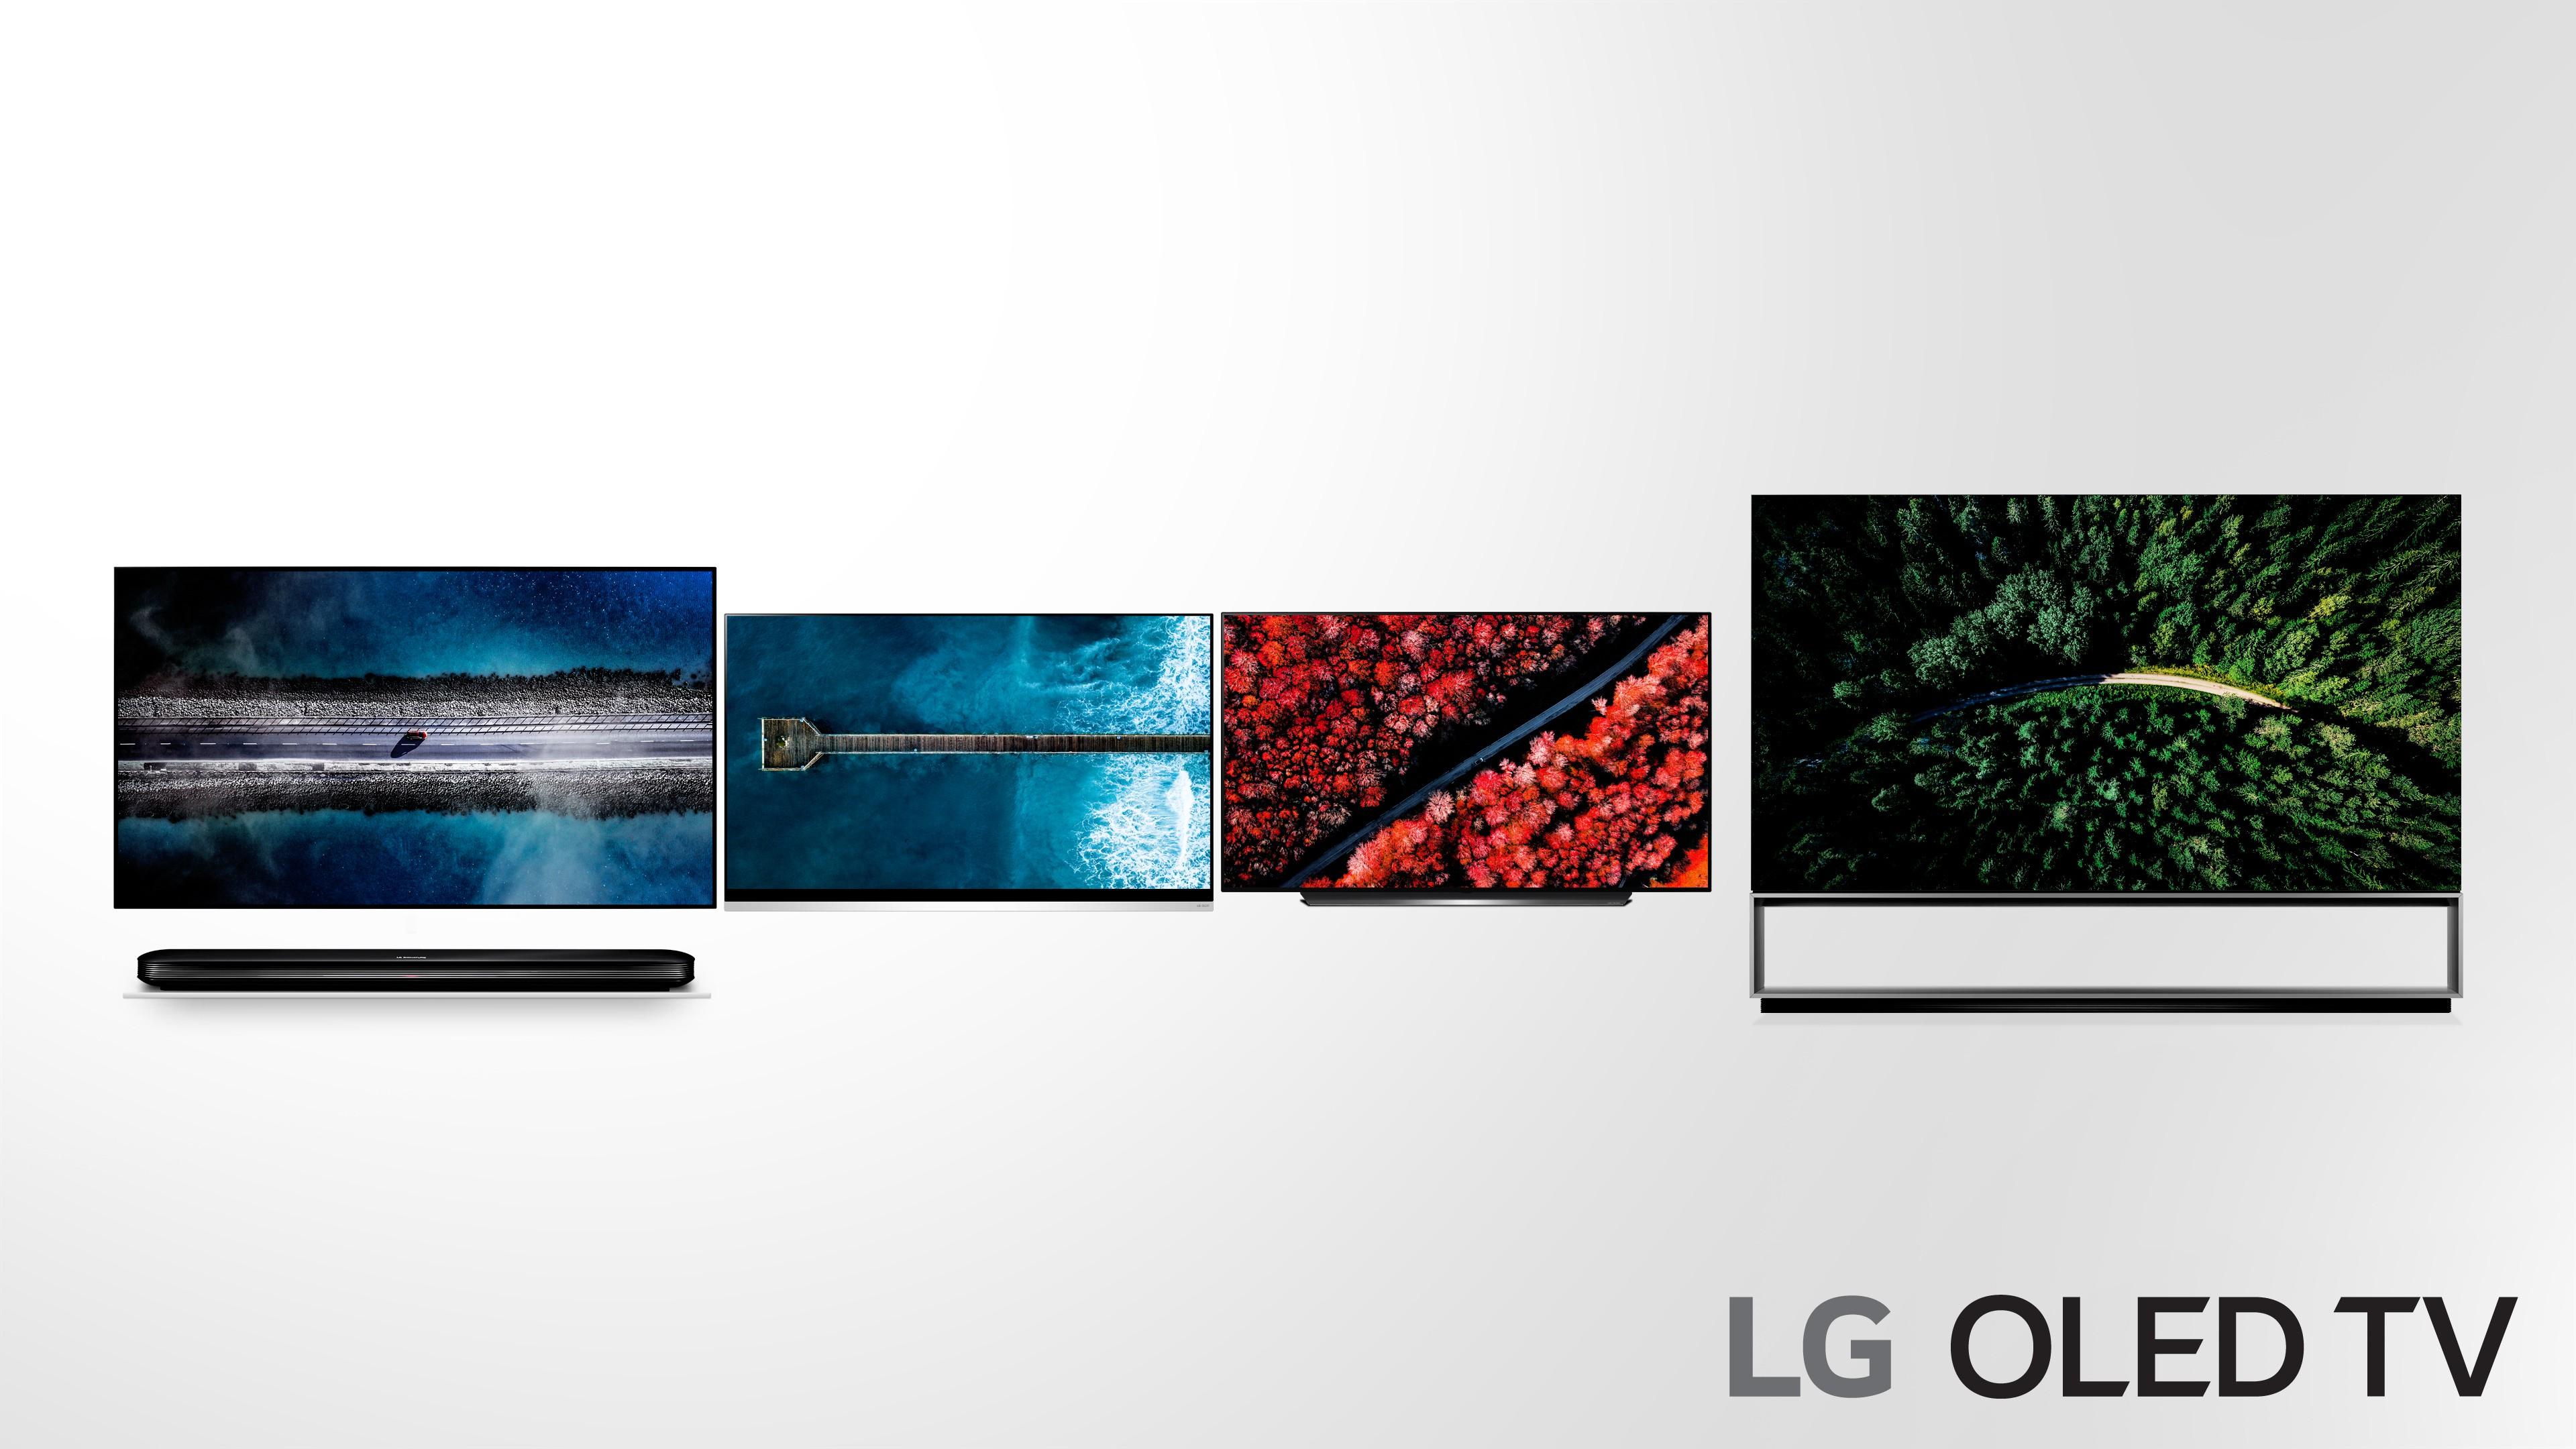 LG reveals UK pricing for 2019 4K OLED TVs | What Hi-Fi?